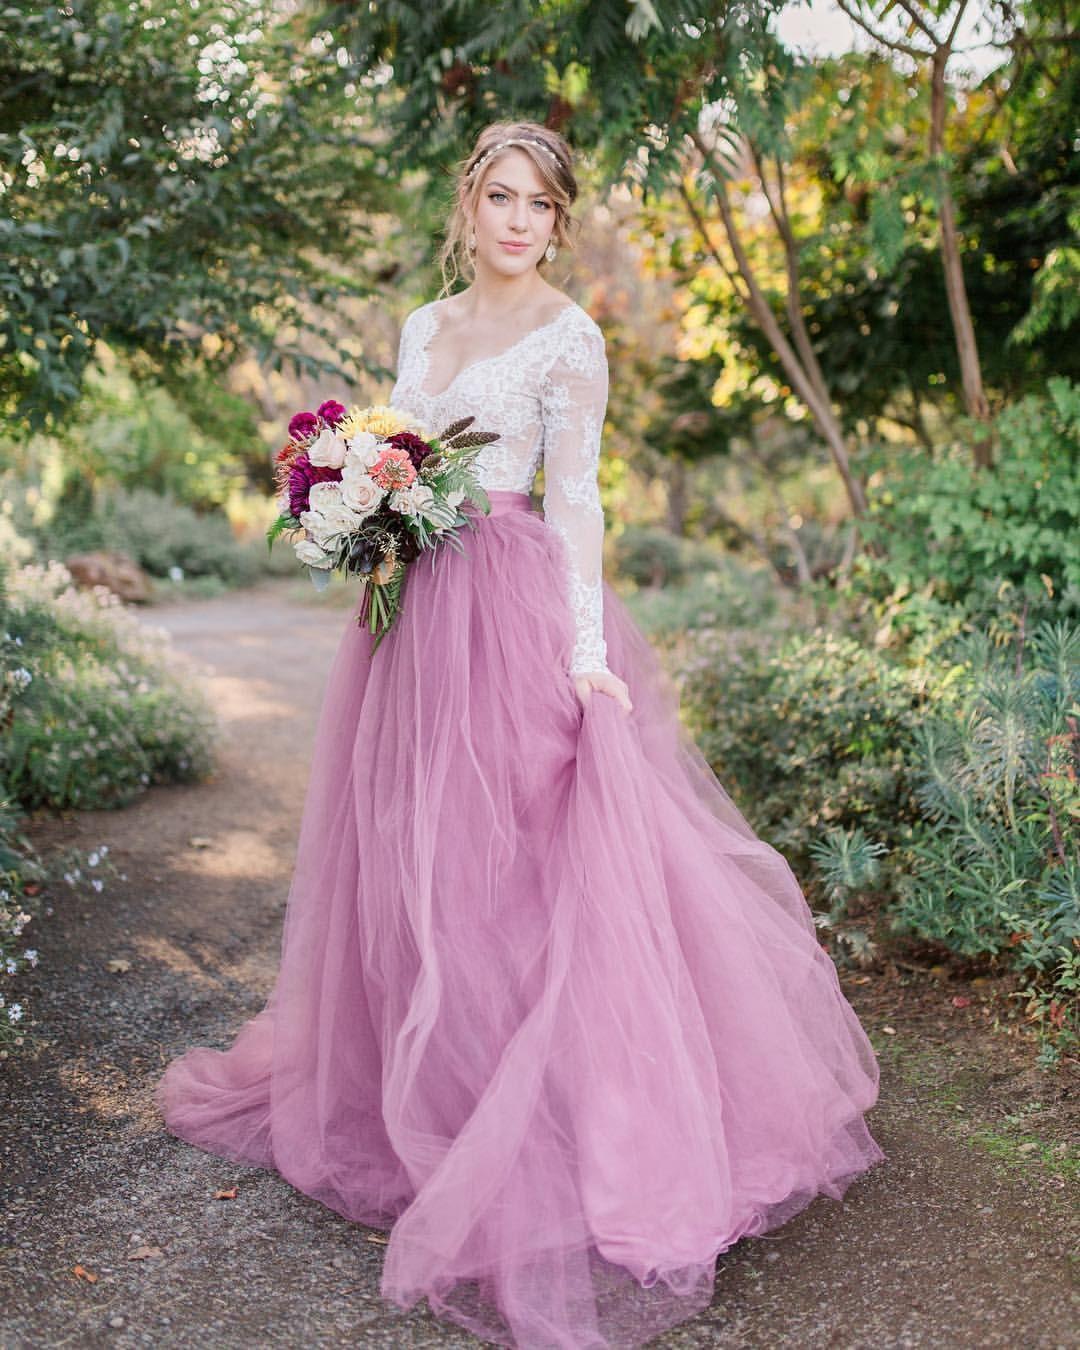 Pin de Lizette 💖🌈 💖 en Two Strong Gay Brides | Pinterest | Vestiditos